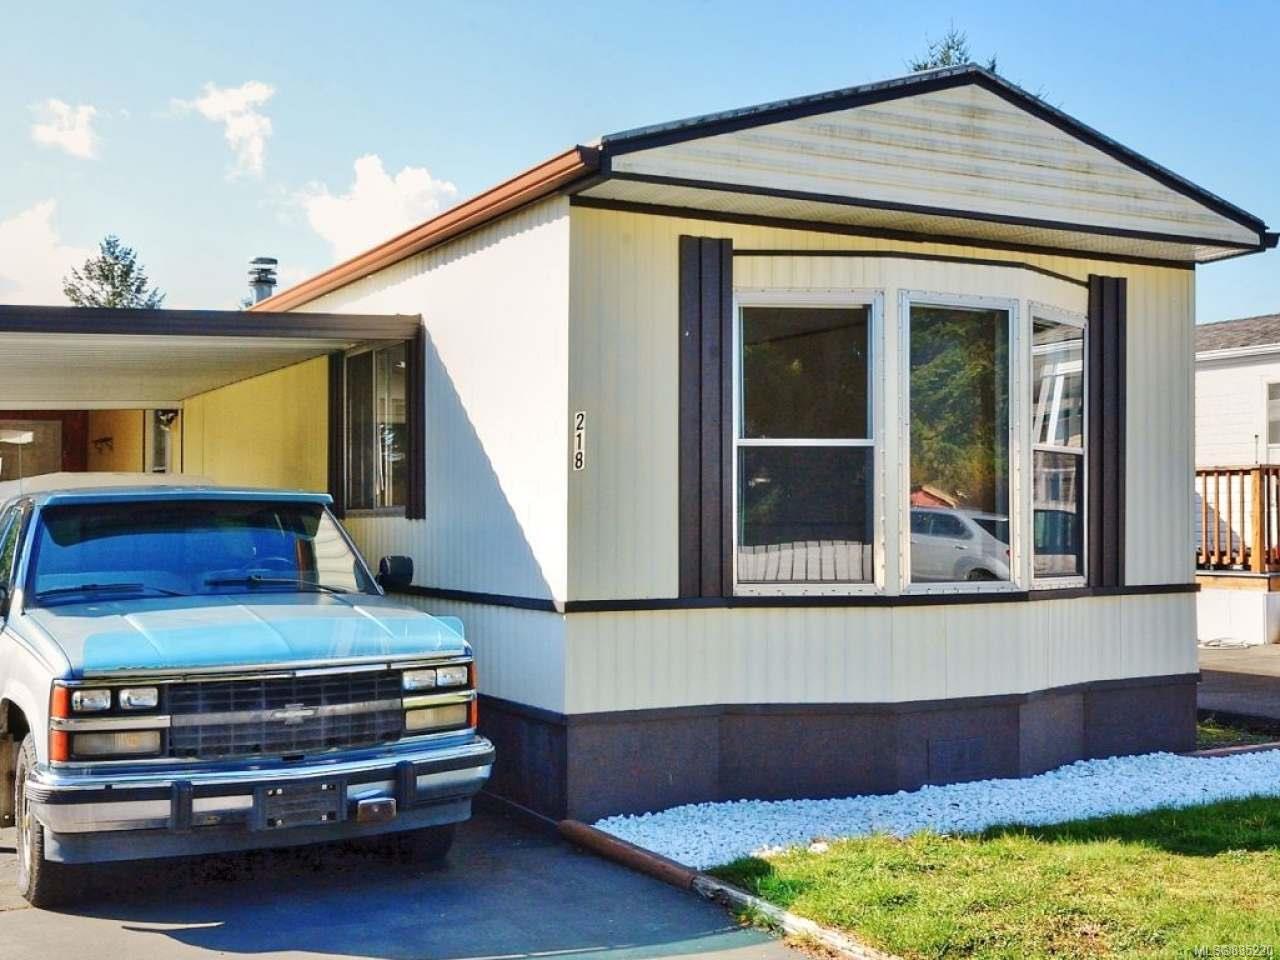 Main Photo: 218 2465 Apollo Dr in NANOOSE BAY: PQ Nanoose Manufactured Home for sale (Parksville/Qualicum)  : MLS®# 835220